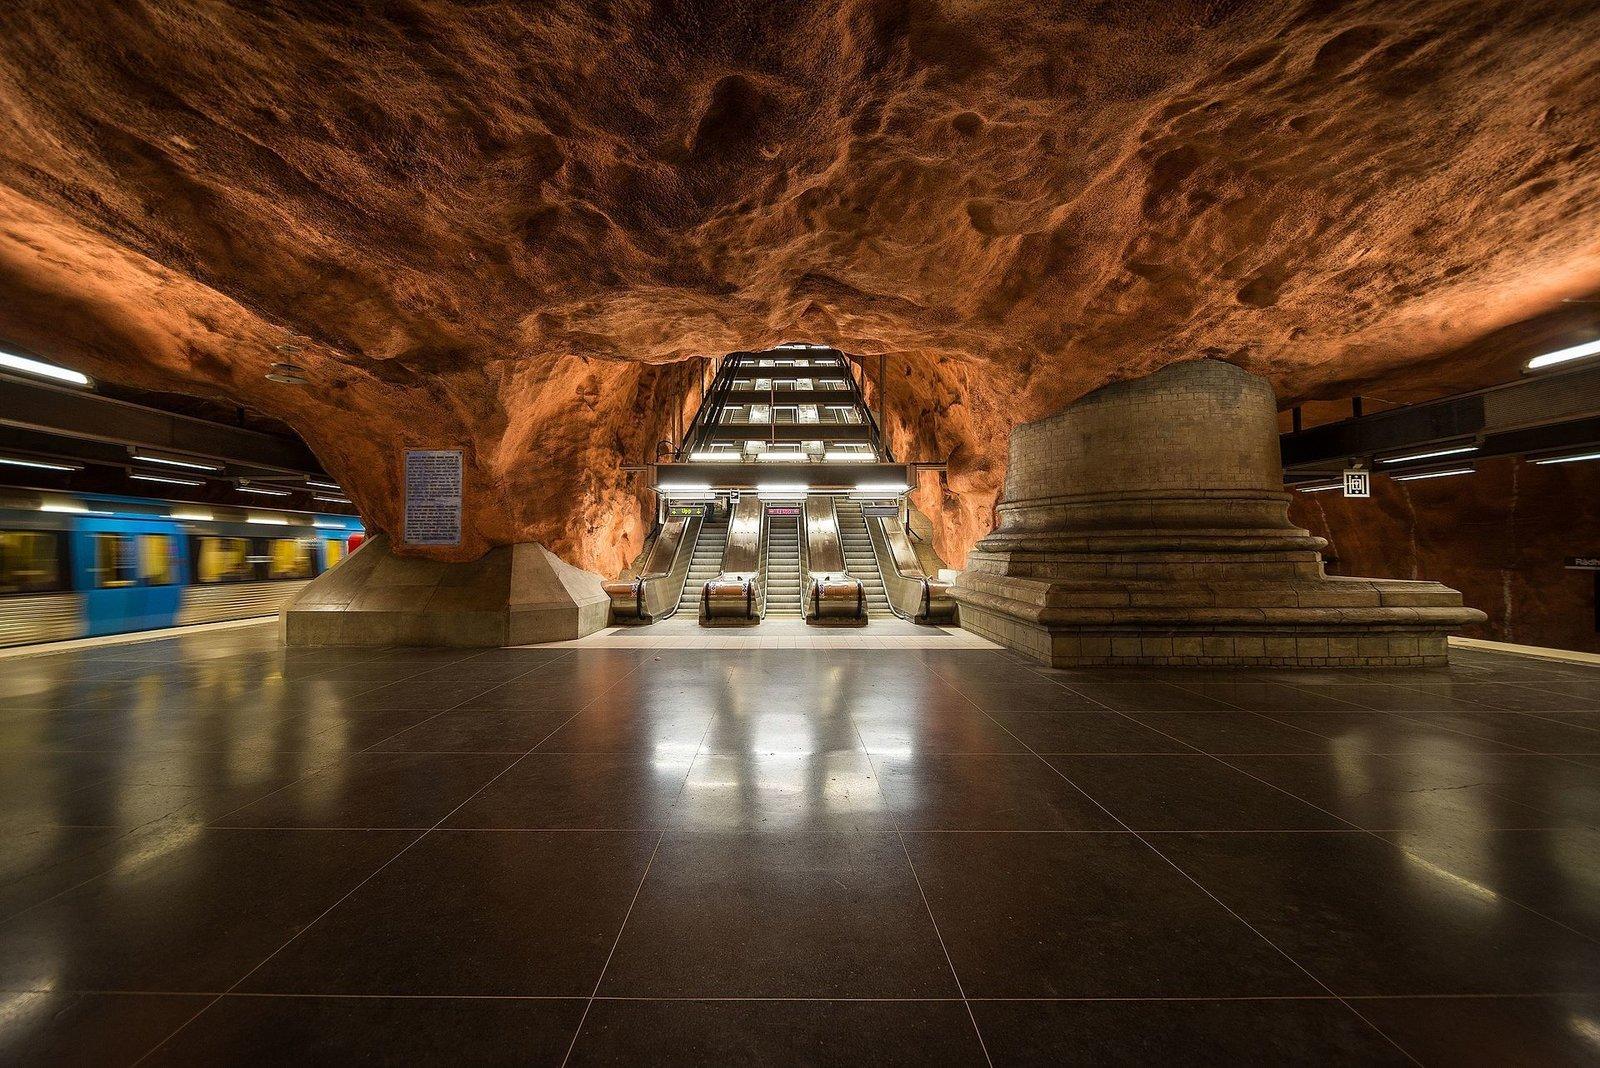 Photo 3 of 10 in Explore the Stockholm Metro For a Tour Through 5 Decades of European Art History